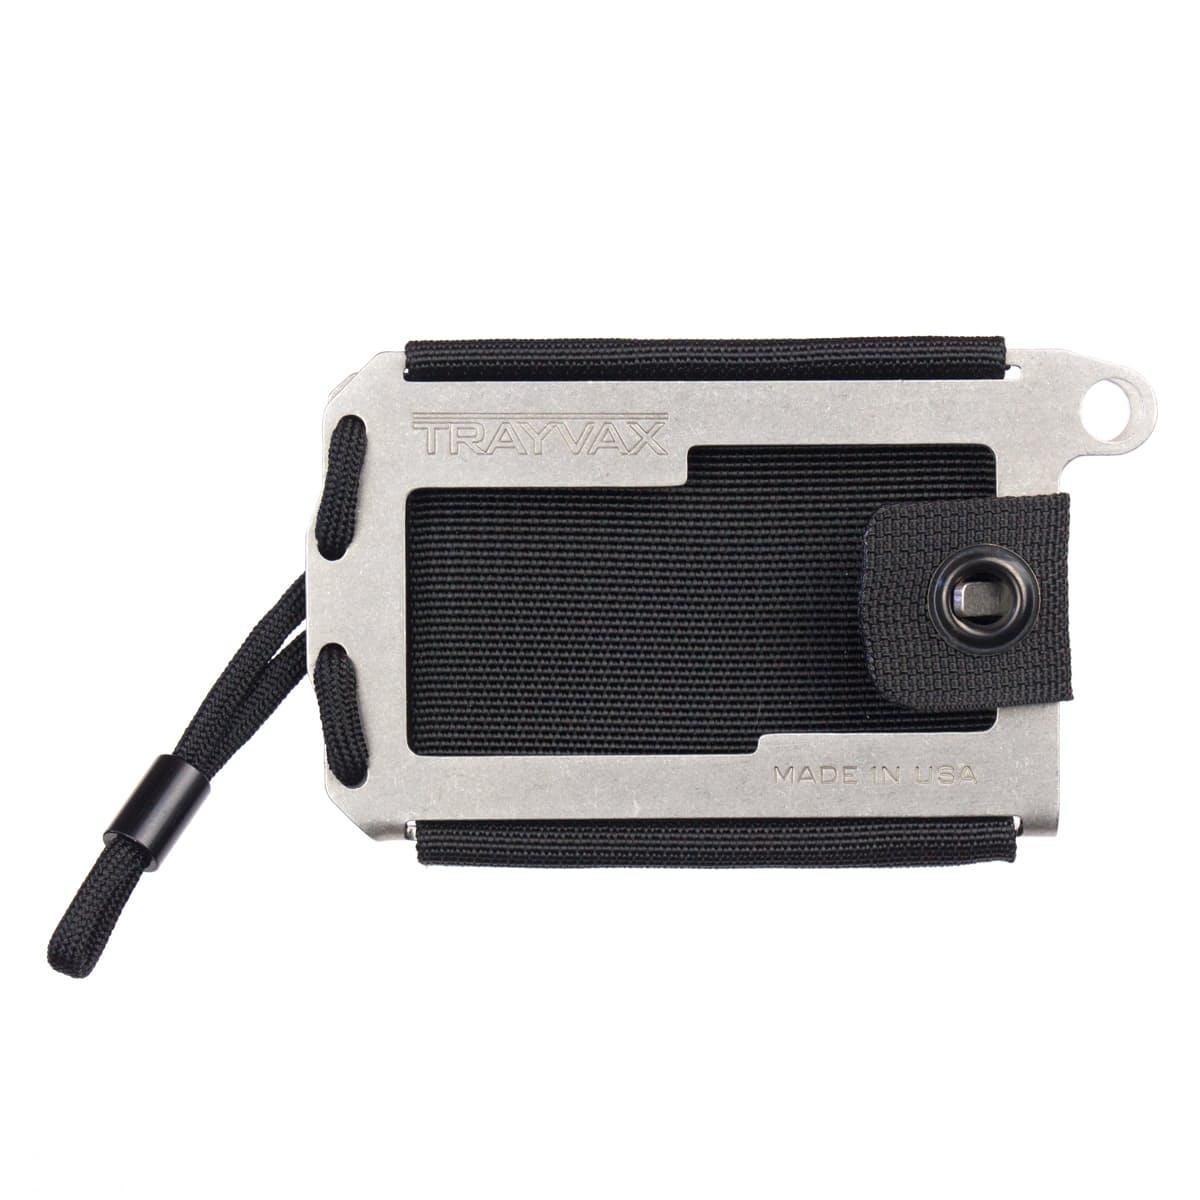 5hocxhtjbj trayvax axis wallet 0 original